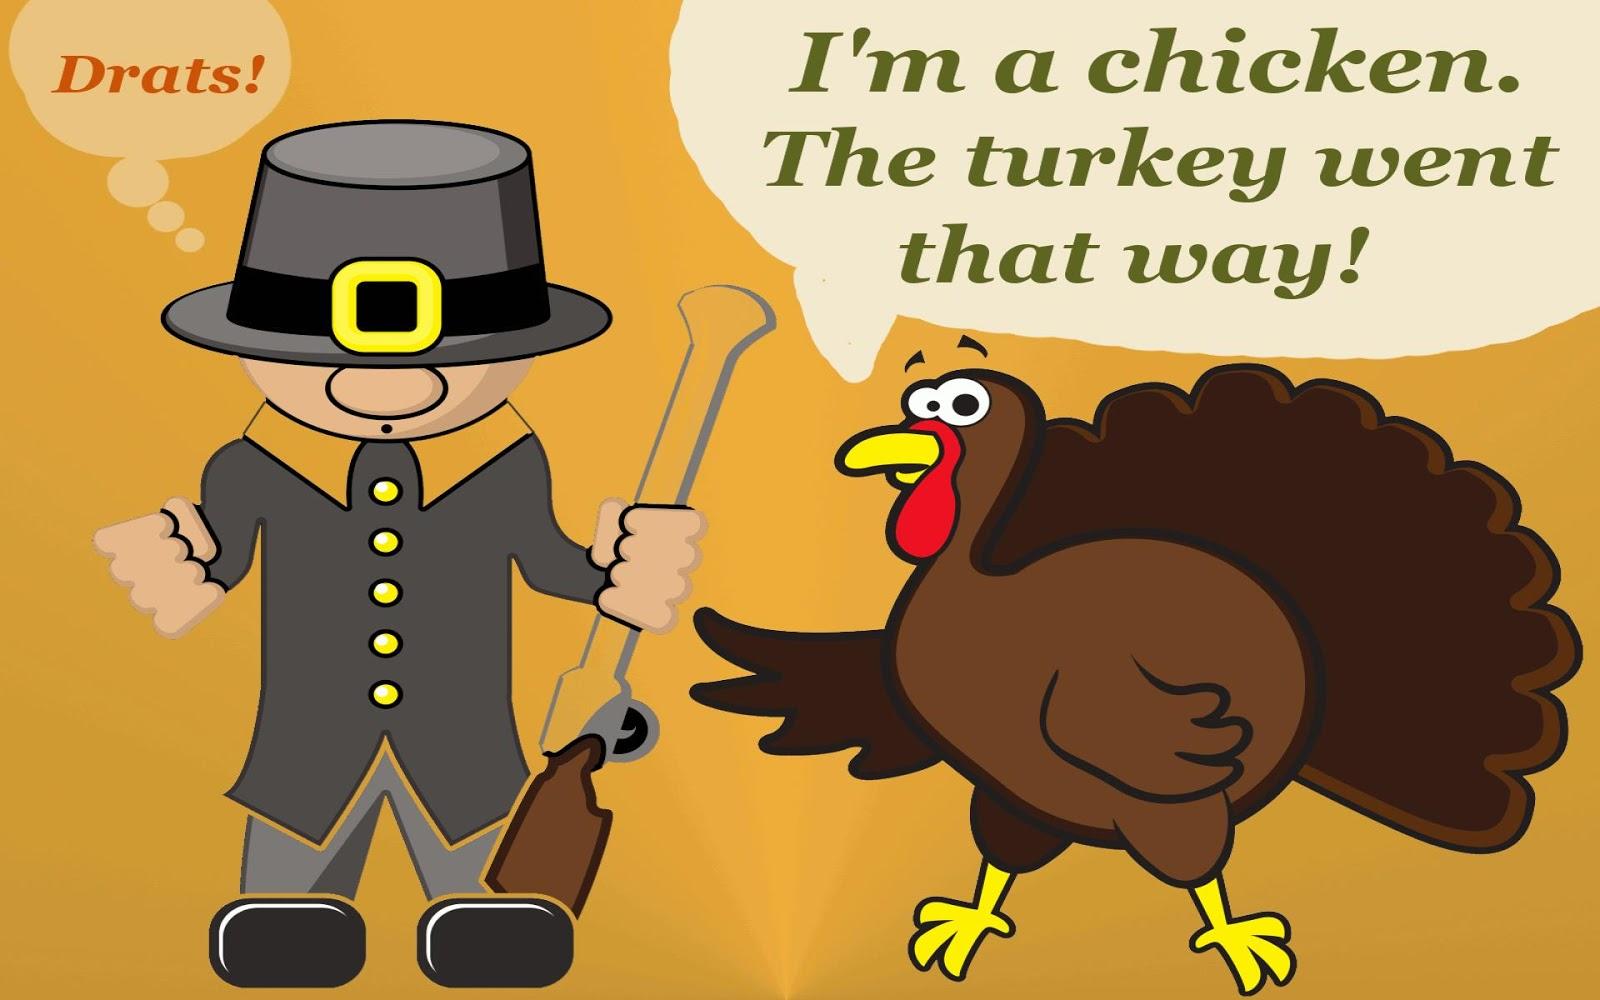 http://1.bp.blogspot.com/-UsTAJFd5MkM/UKOIEsf_TmI/AAAAAAAAAsY/_ePzT6CfAgQ/s1600/turkey-chicken-pilgrim-widescreen11.JPG